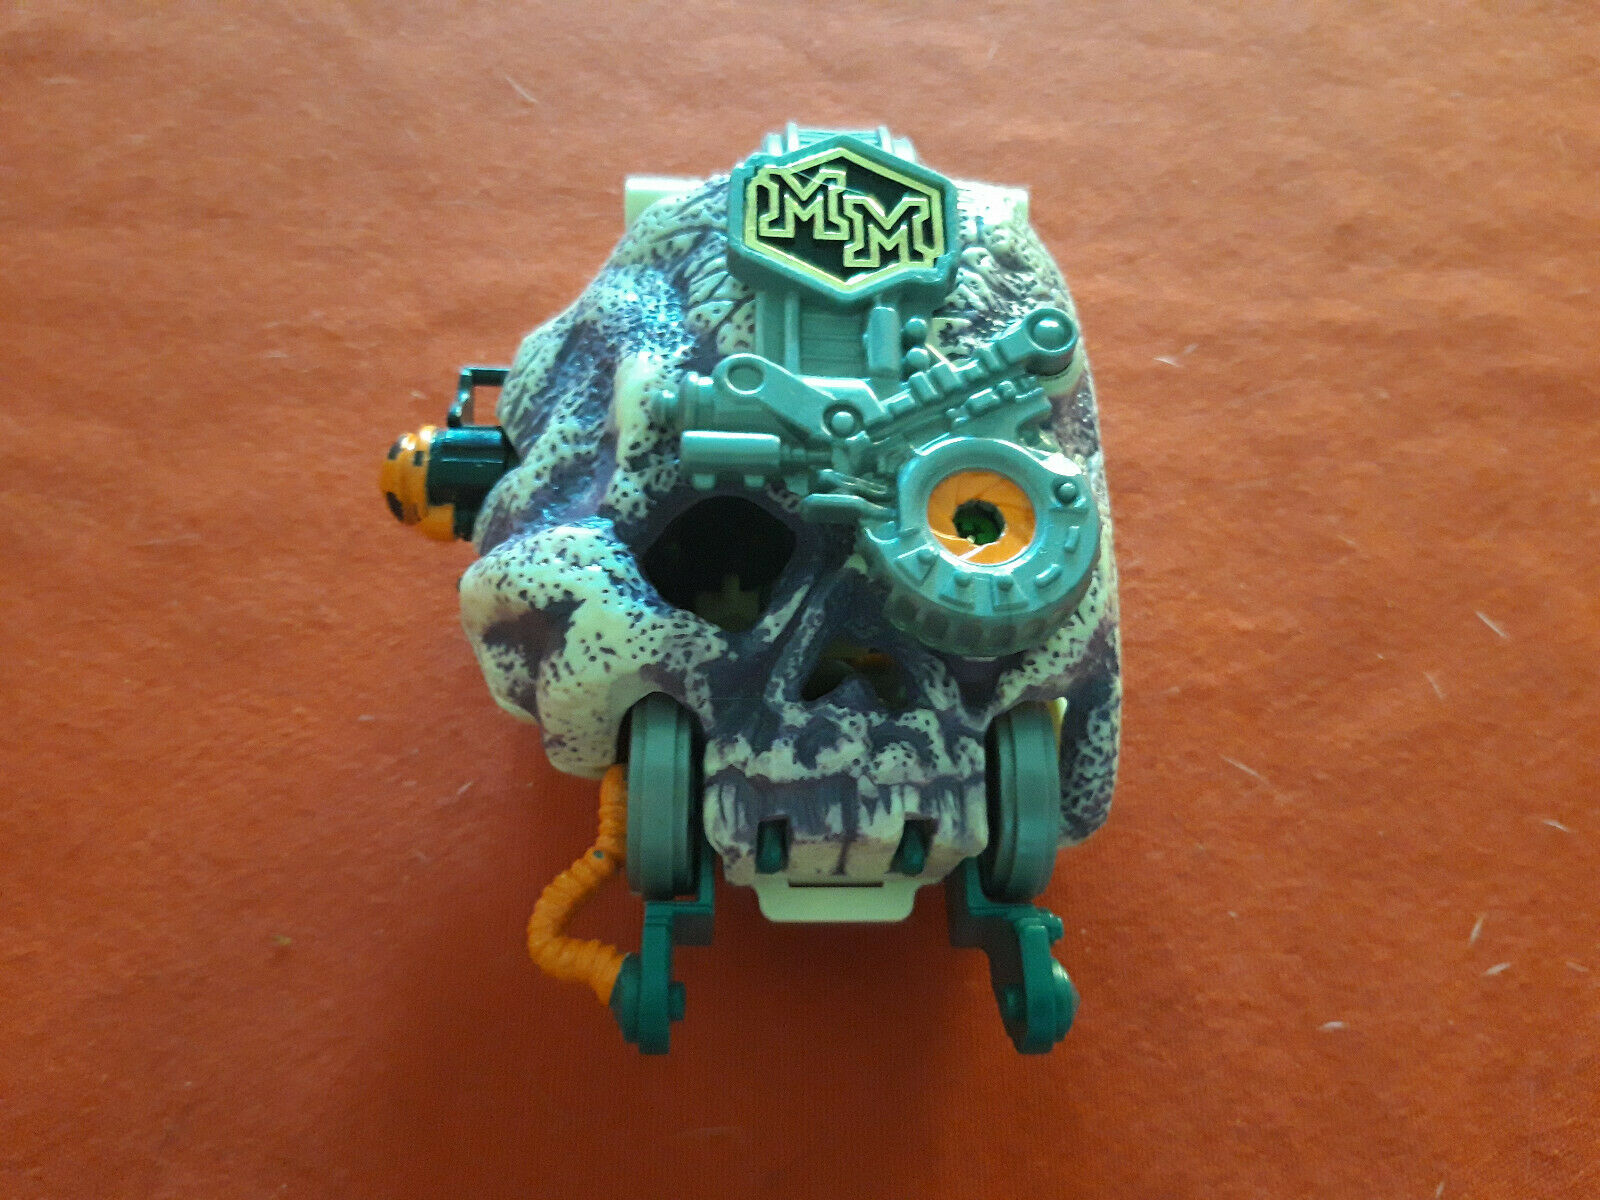 Mighty Max Cyberskull Cyber Skelett Doom Zones Blaubird 1994 Spielzeug Vintage